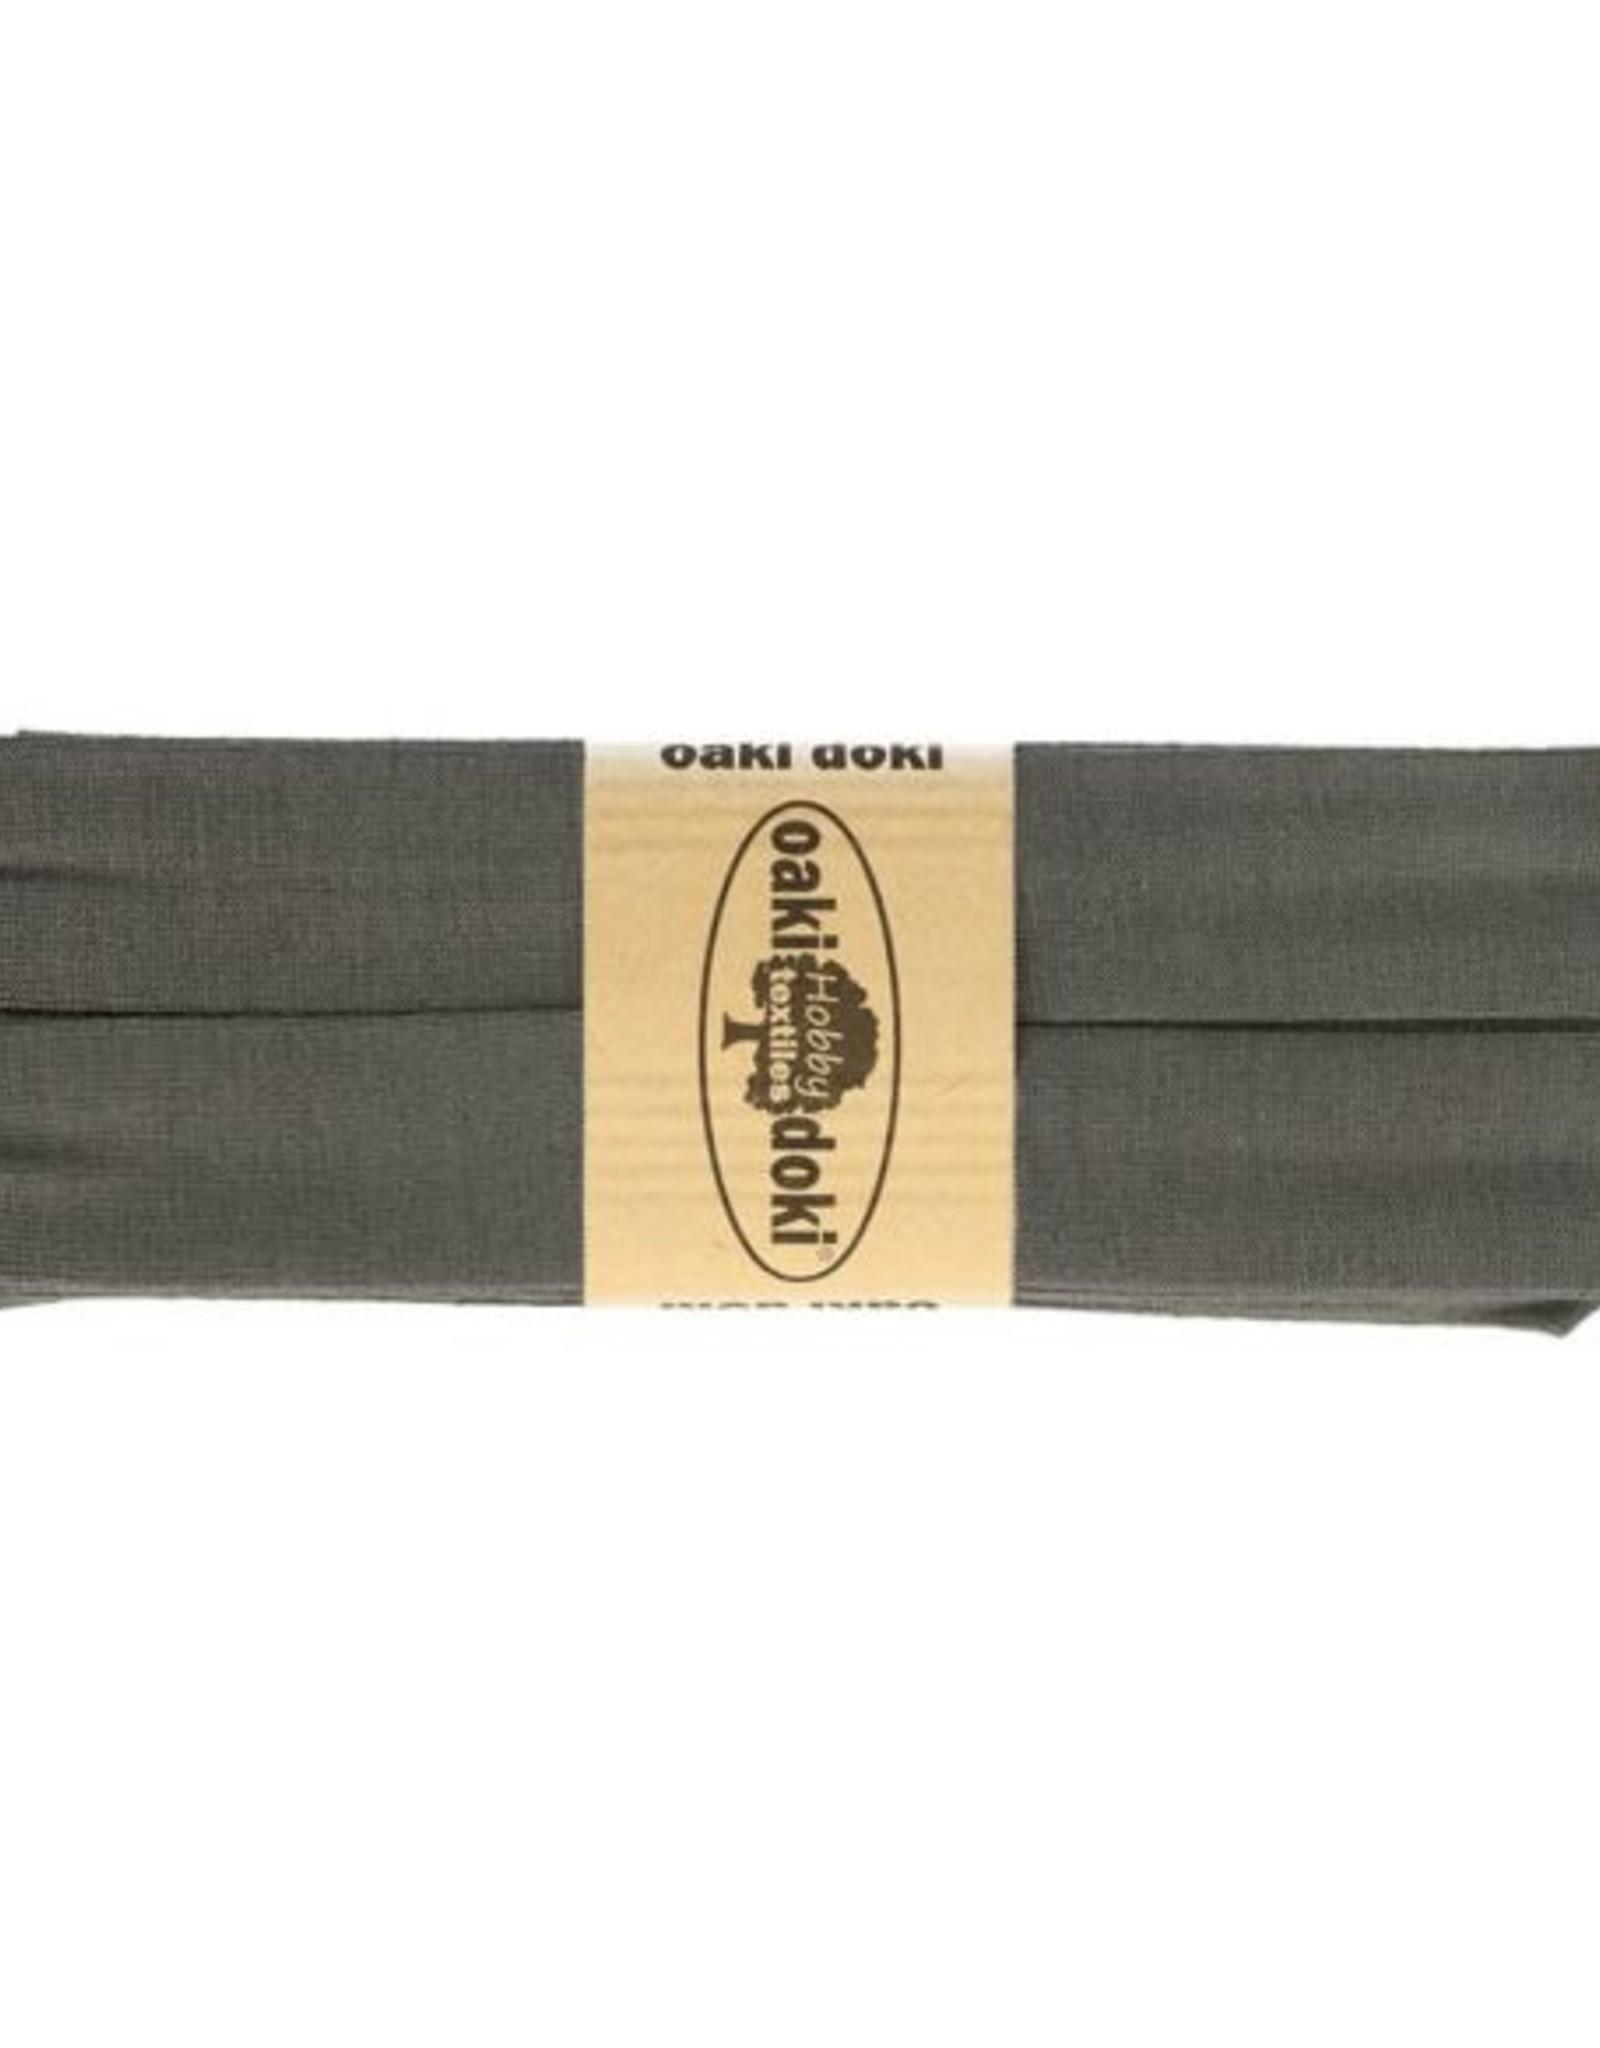 Oaki Doki Tricot de luxe jersey biaisband 20mm x 3m 115